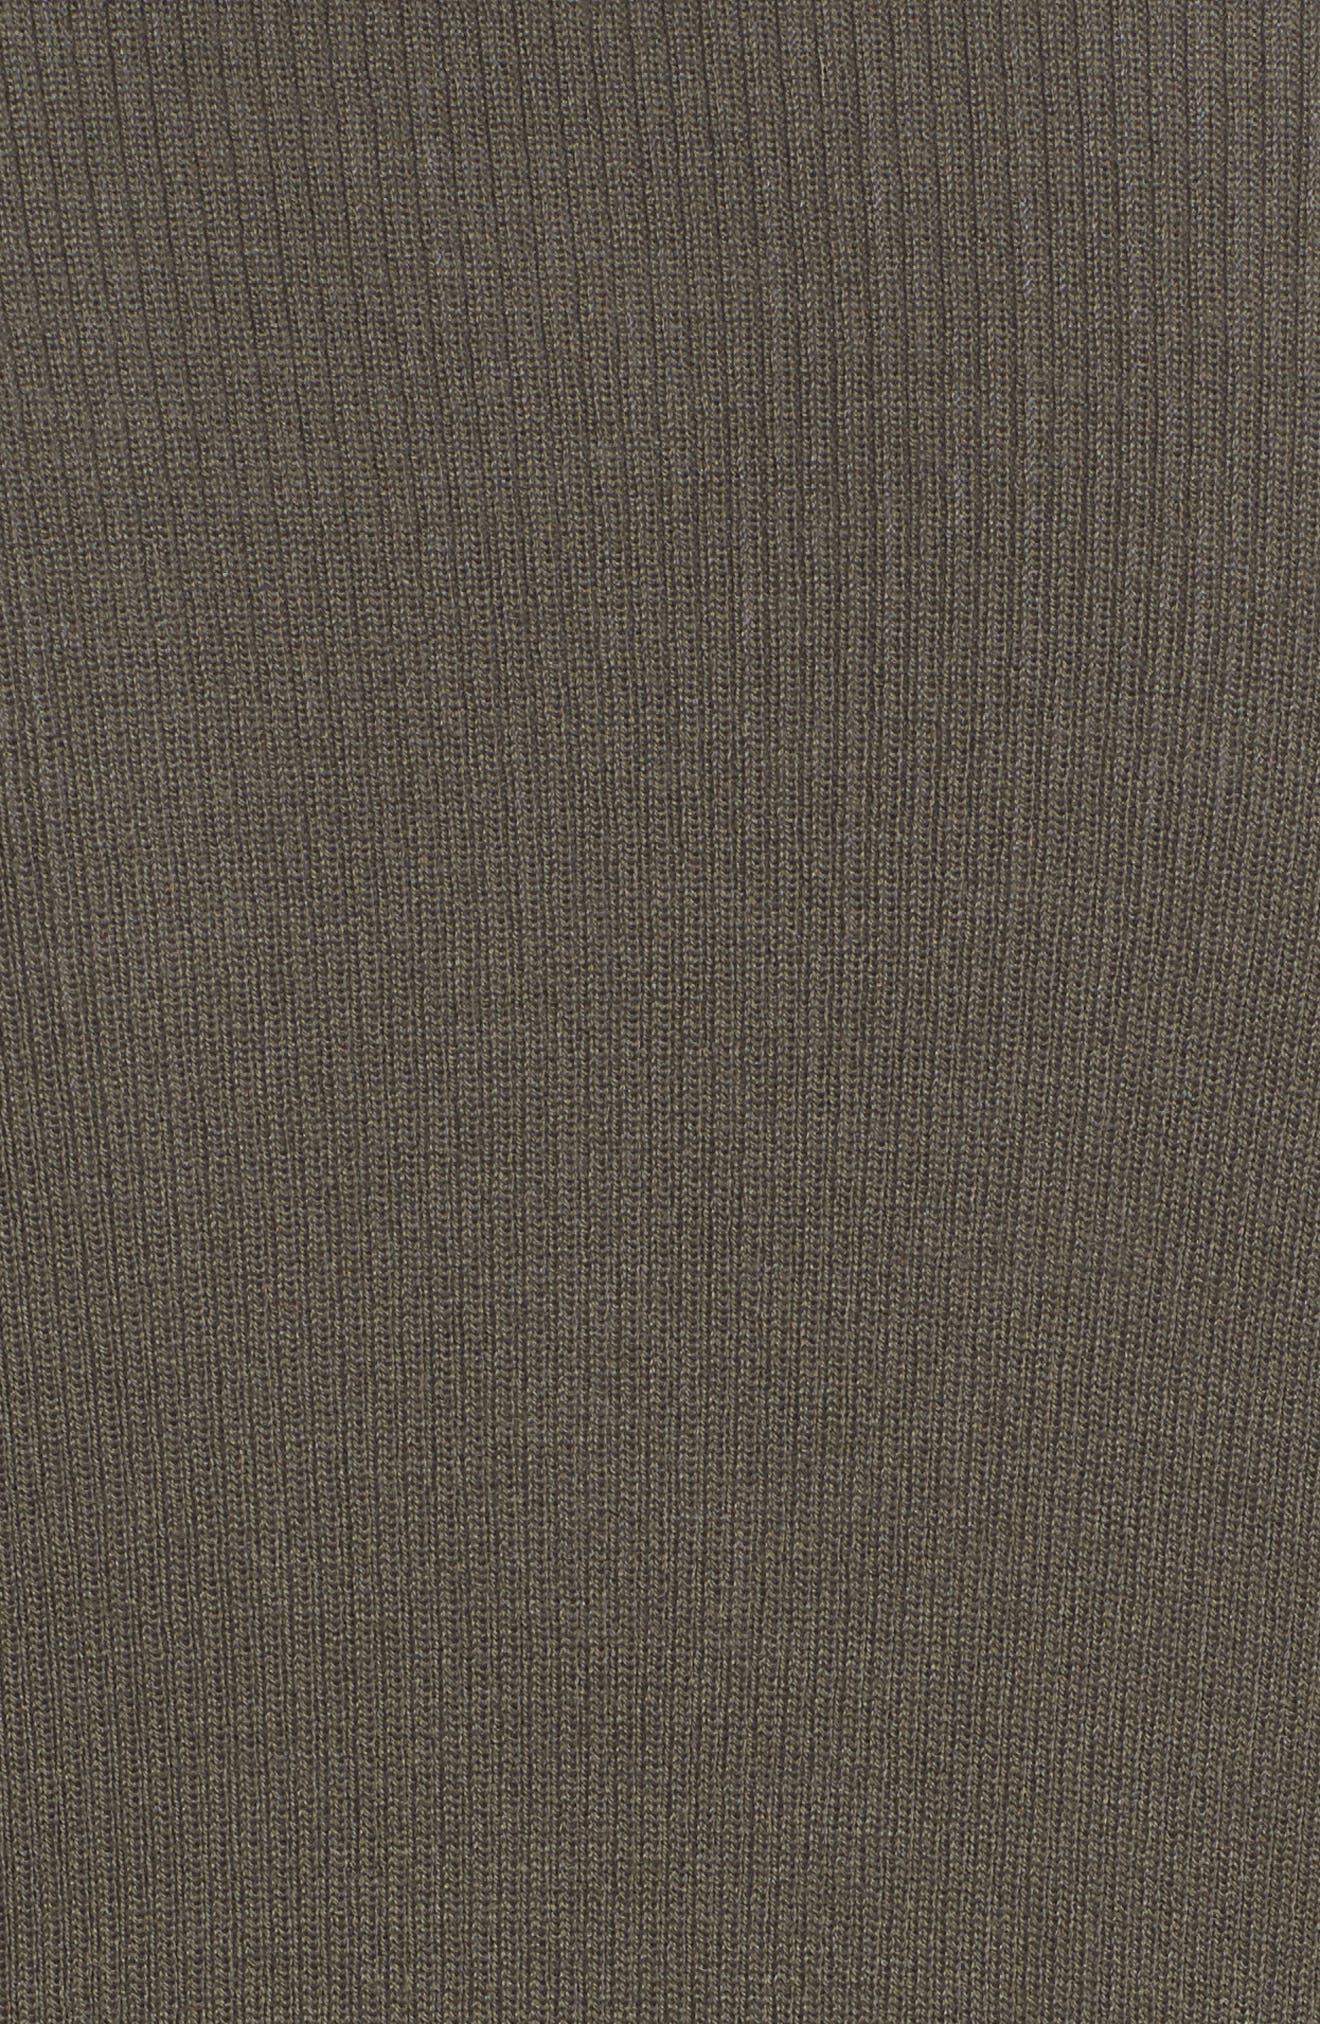 Rib Knit Wool Blend Cardigan,                             Alternate thumbnail 88, color,